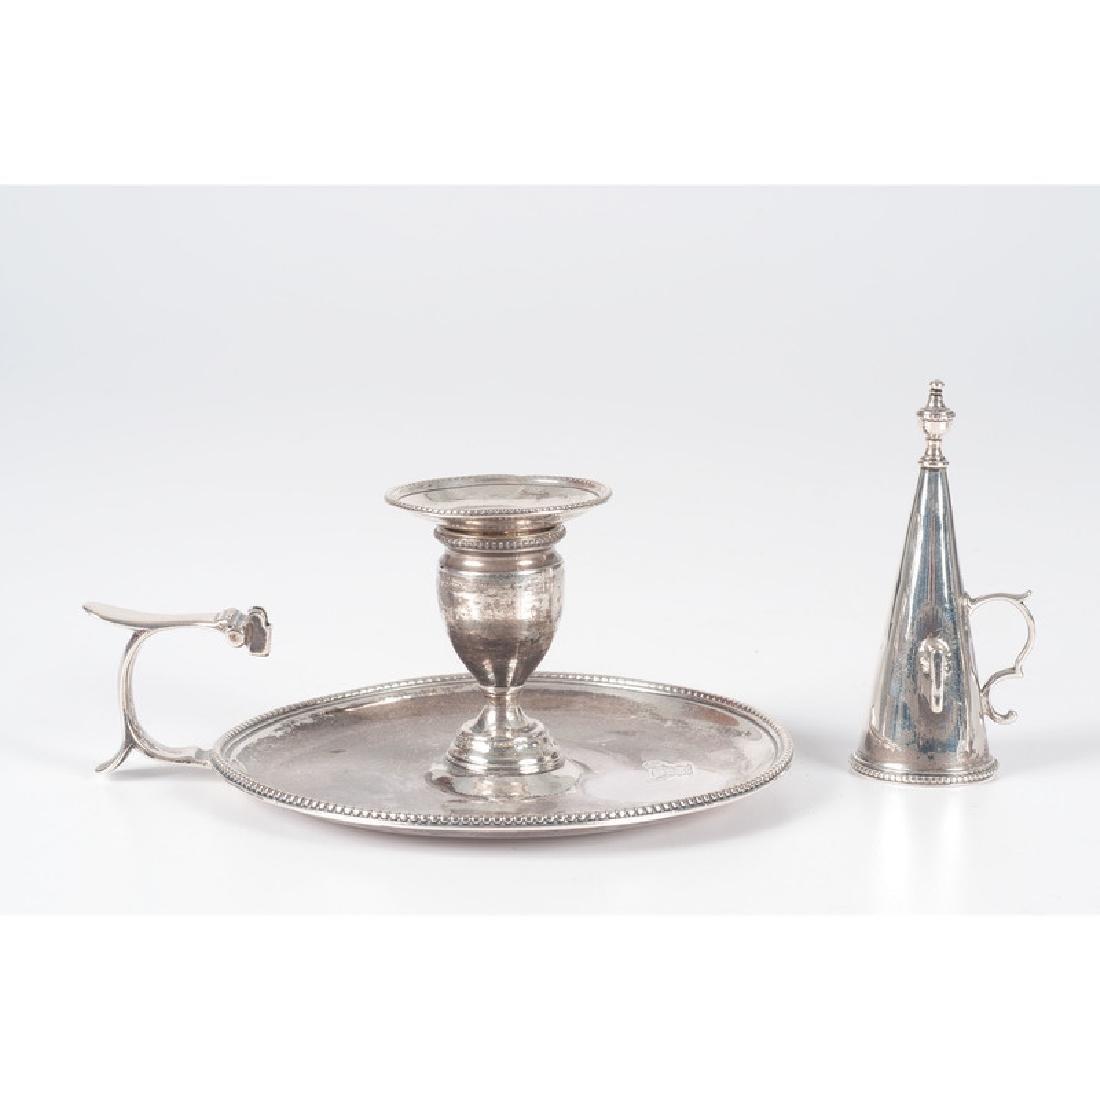 English Sterling Silver Chambersticks - 2